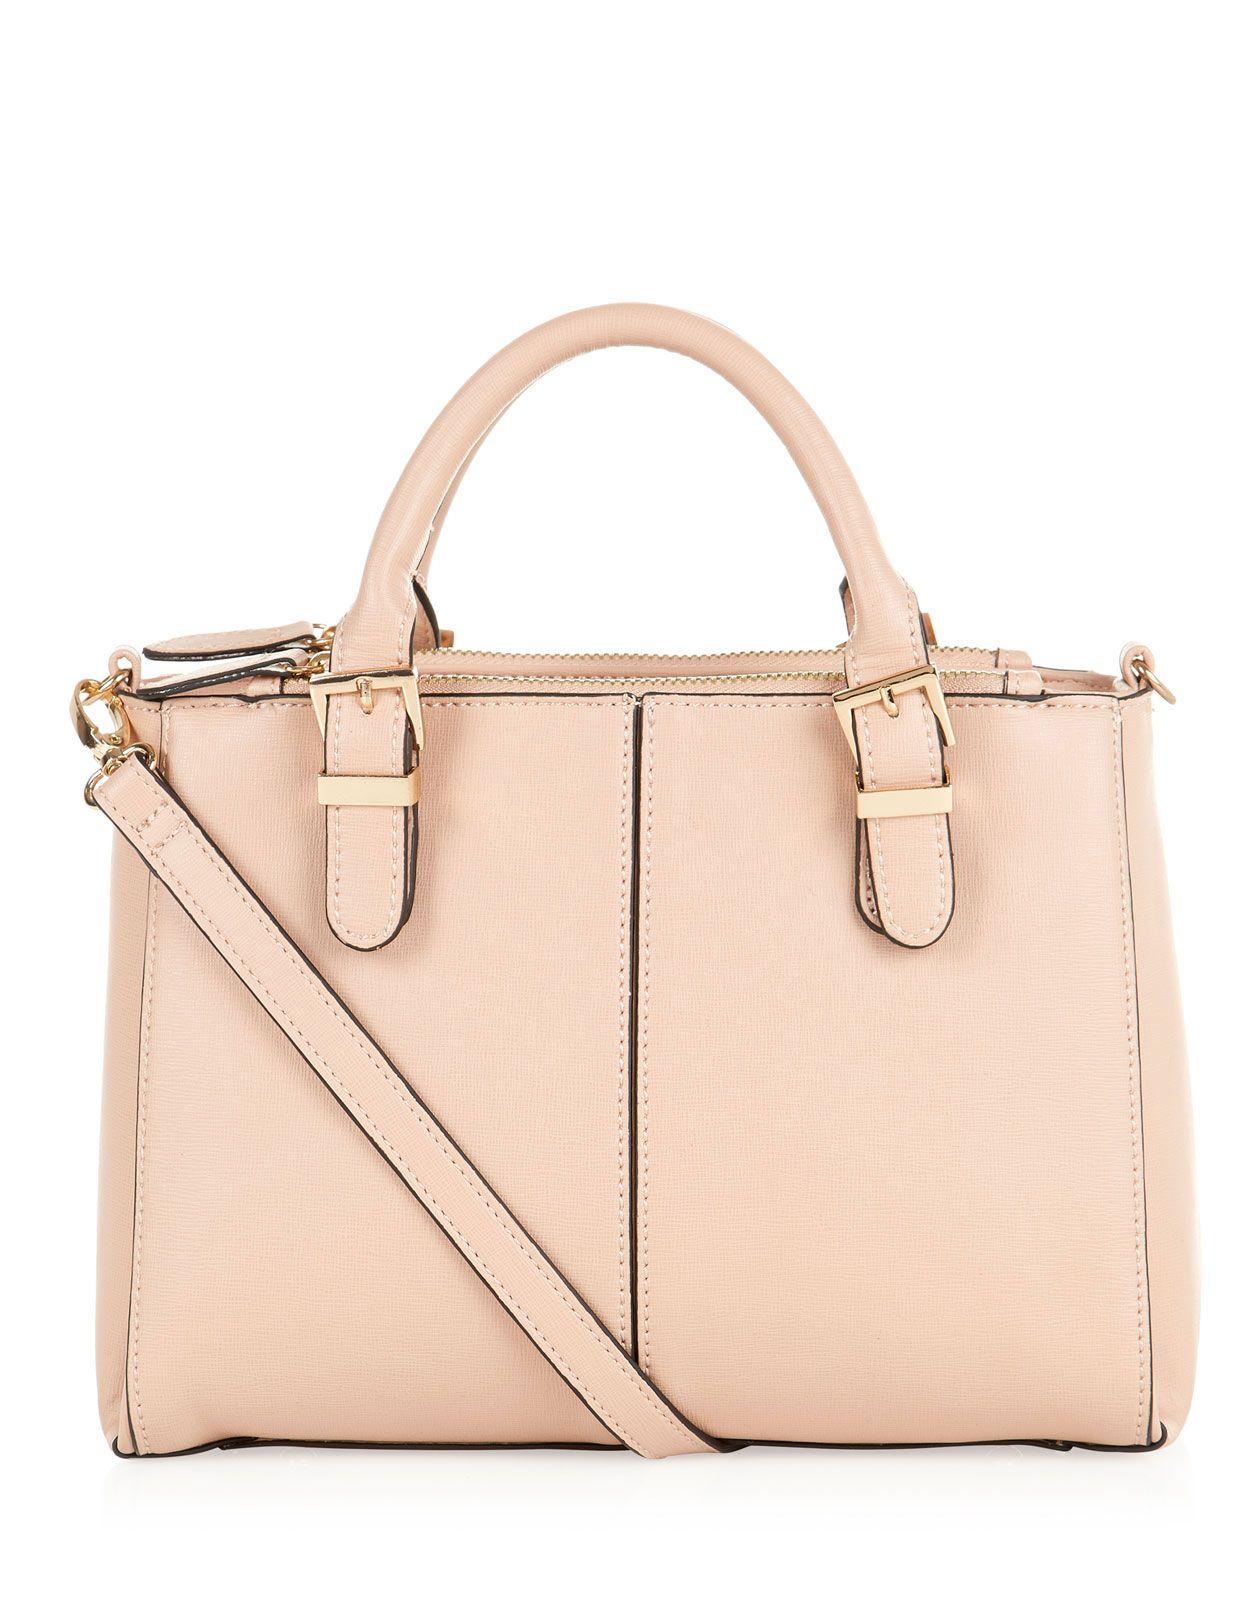 Dani Double Zip Handheld Bag As seen in People Style Watch ...